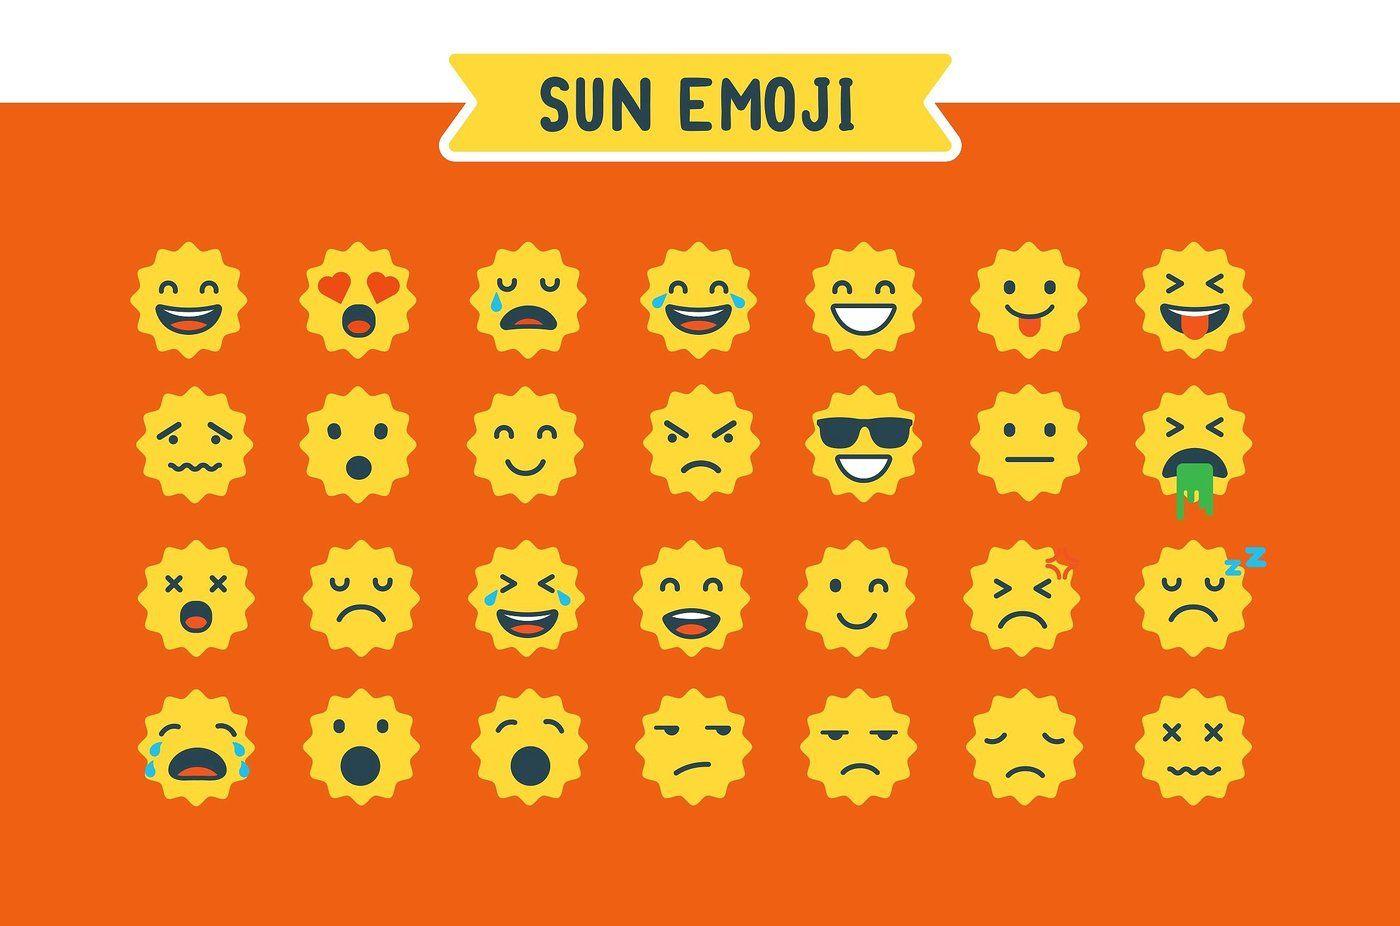 Sun Emoji By Brandspark Thehungryjpeg Com